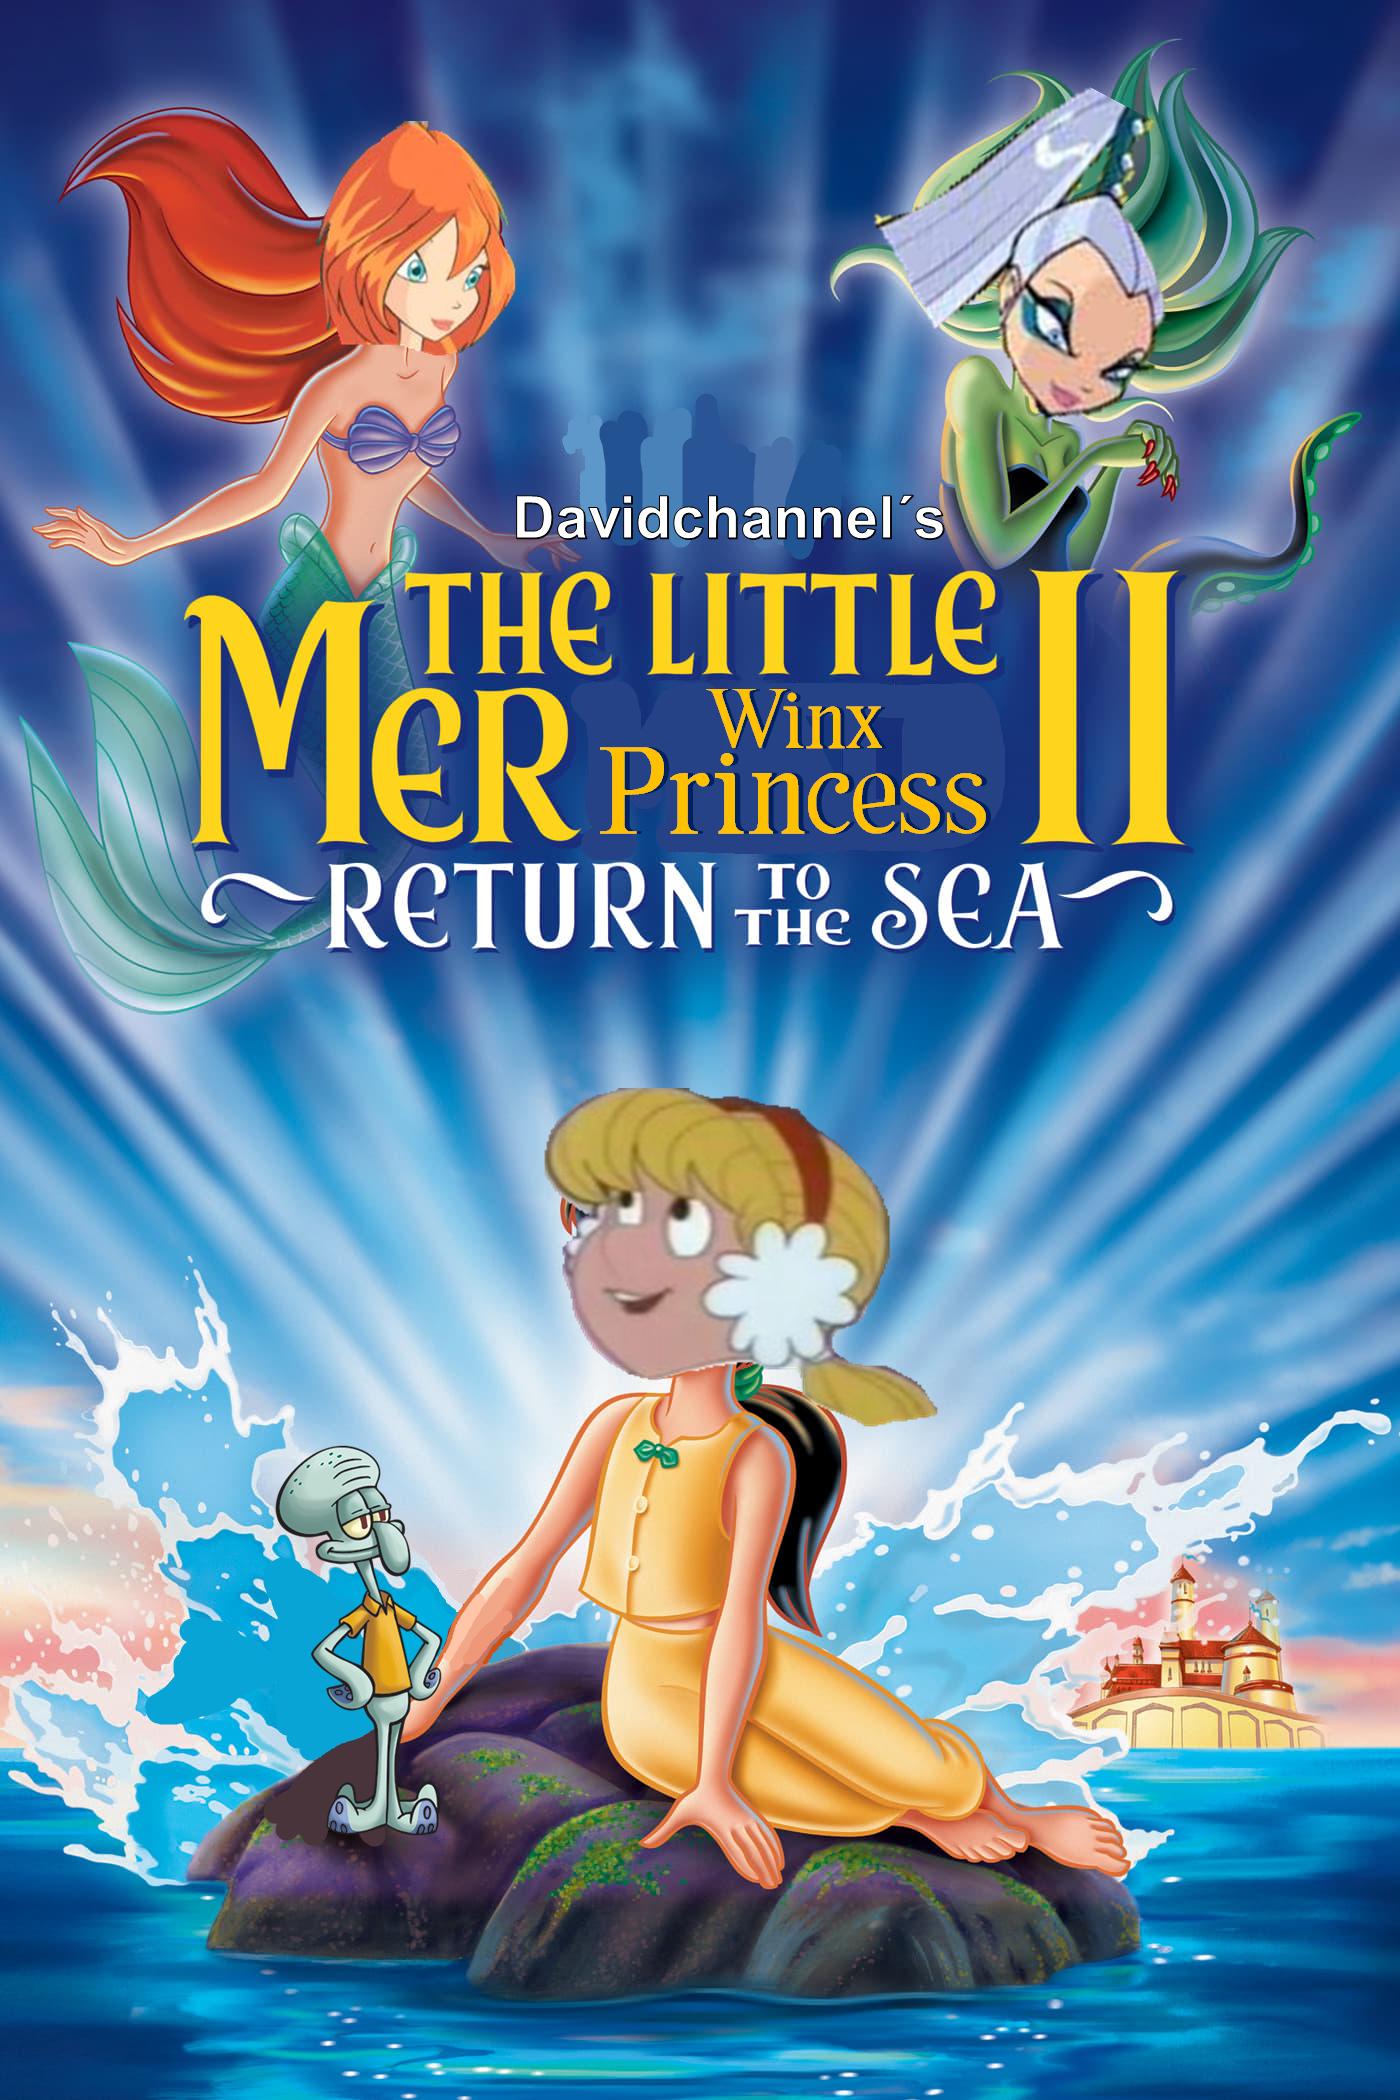 The Little Mer-Winx Princess 2: Return to the Sea (2000)